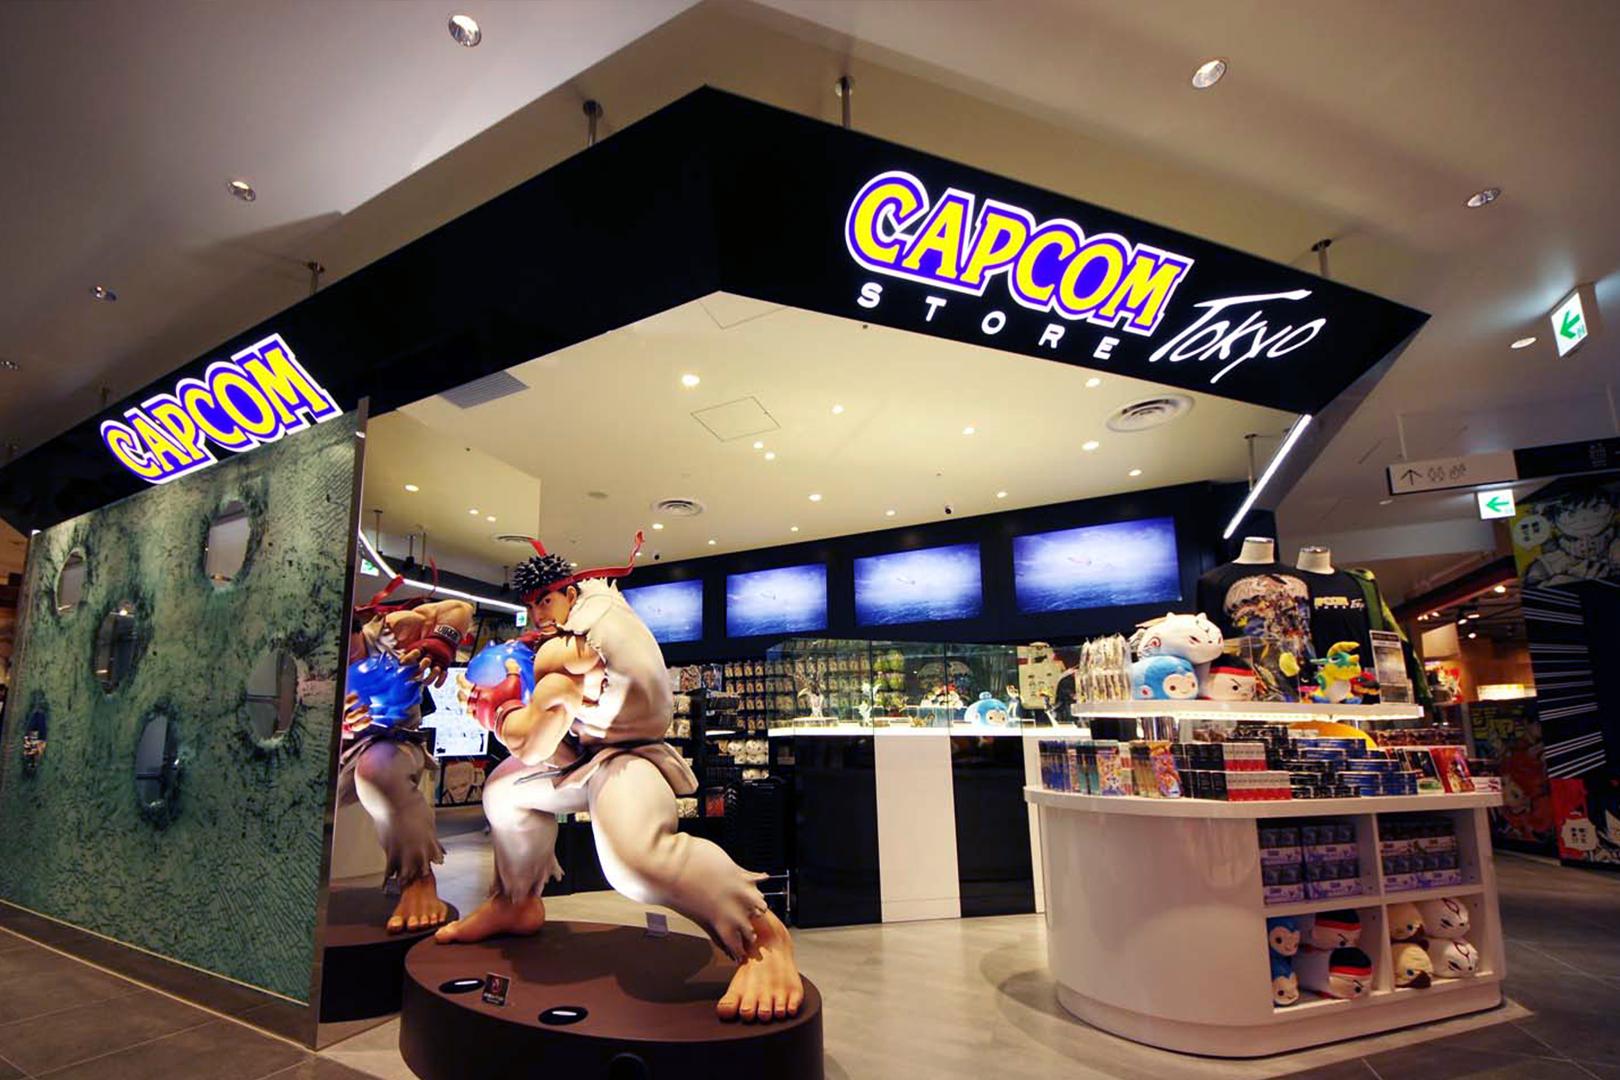 The Capcom Shopping Experience